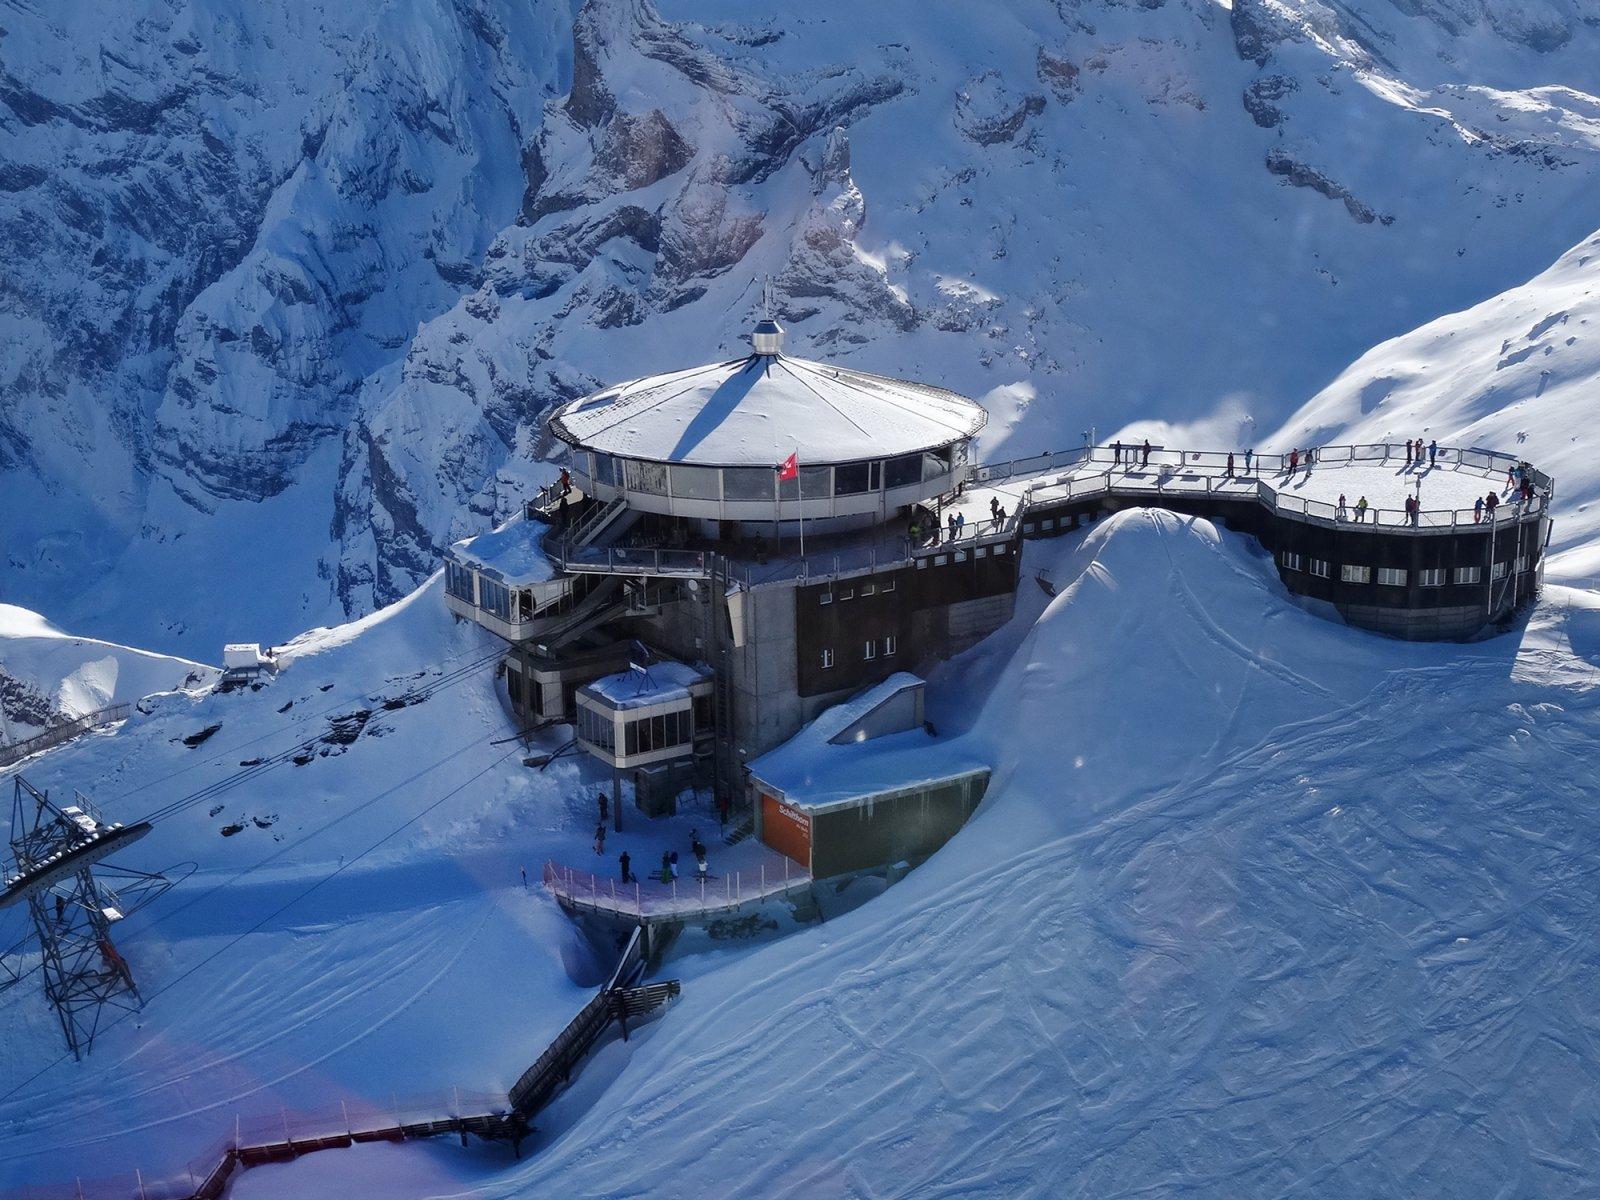 James Bond Mount Schilthorn